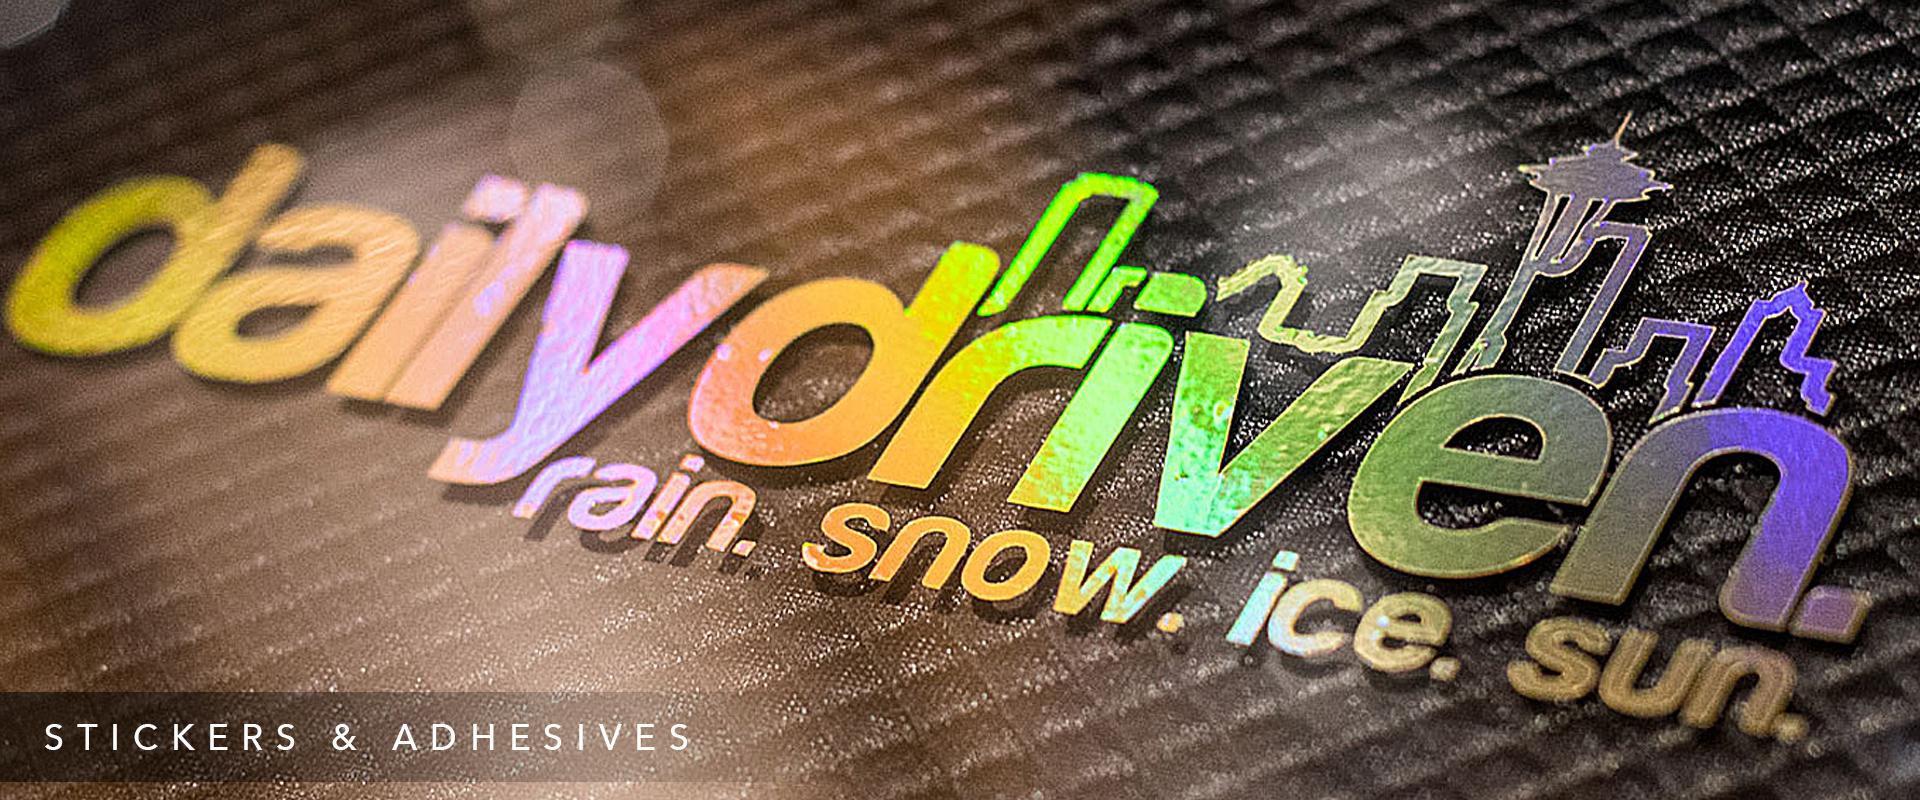 JoshMackey-Merchandise-DailyDriven-Stickers.jpg